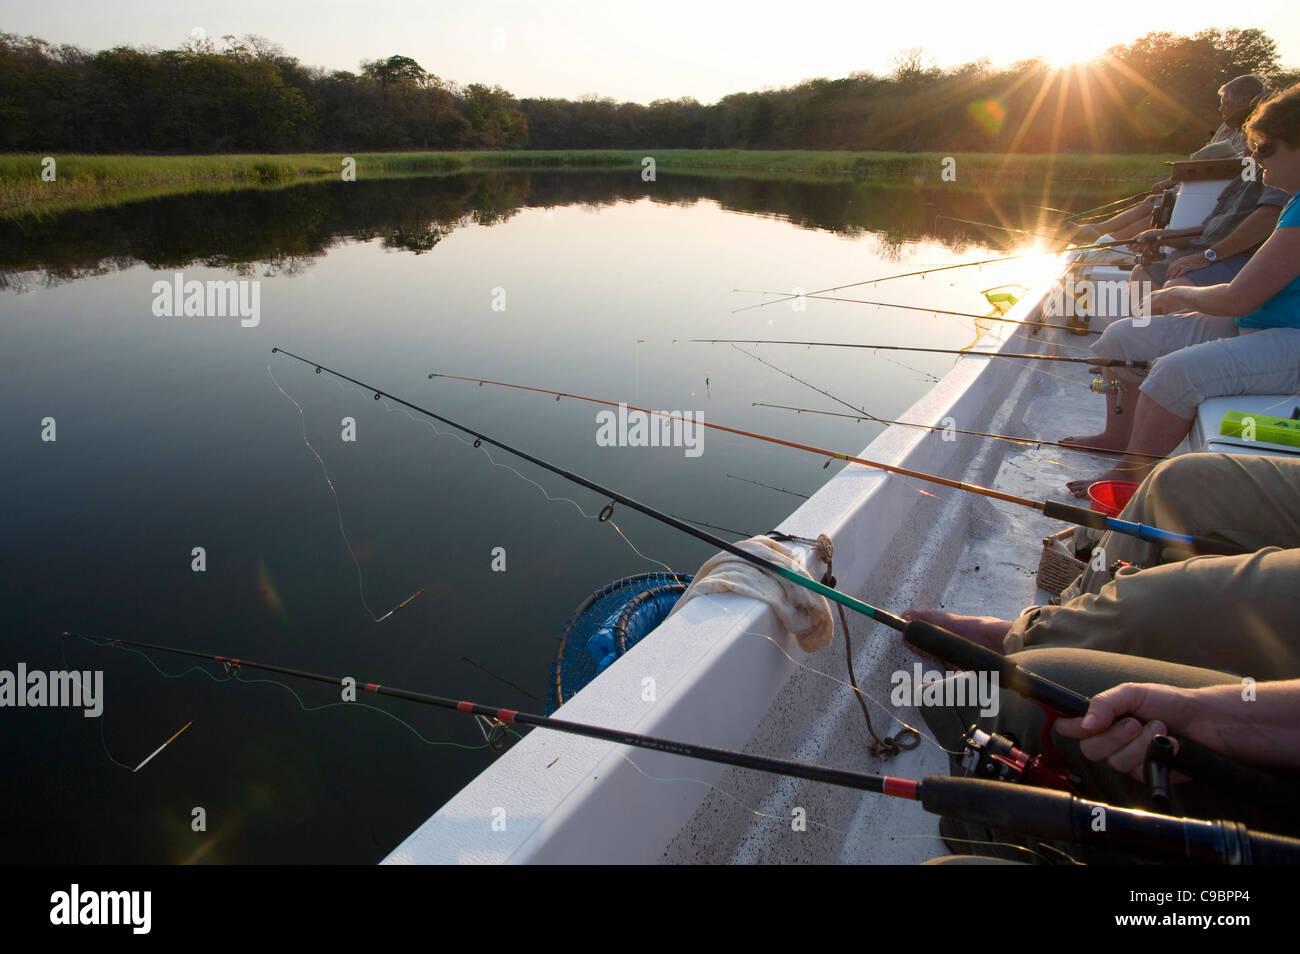 People fishing at Lake Kariba, near Binga, Midlands Province, Zimbabwe - Stock Image